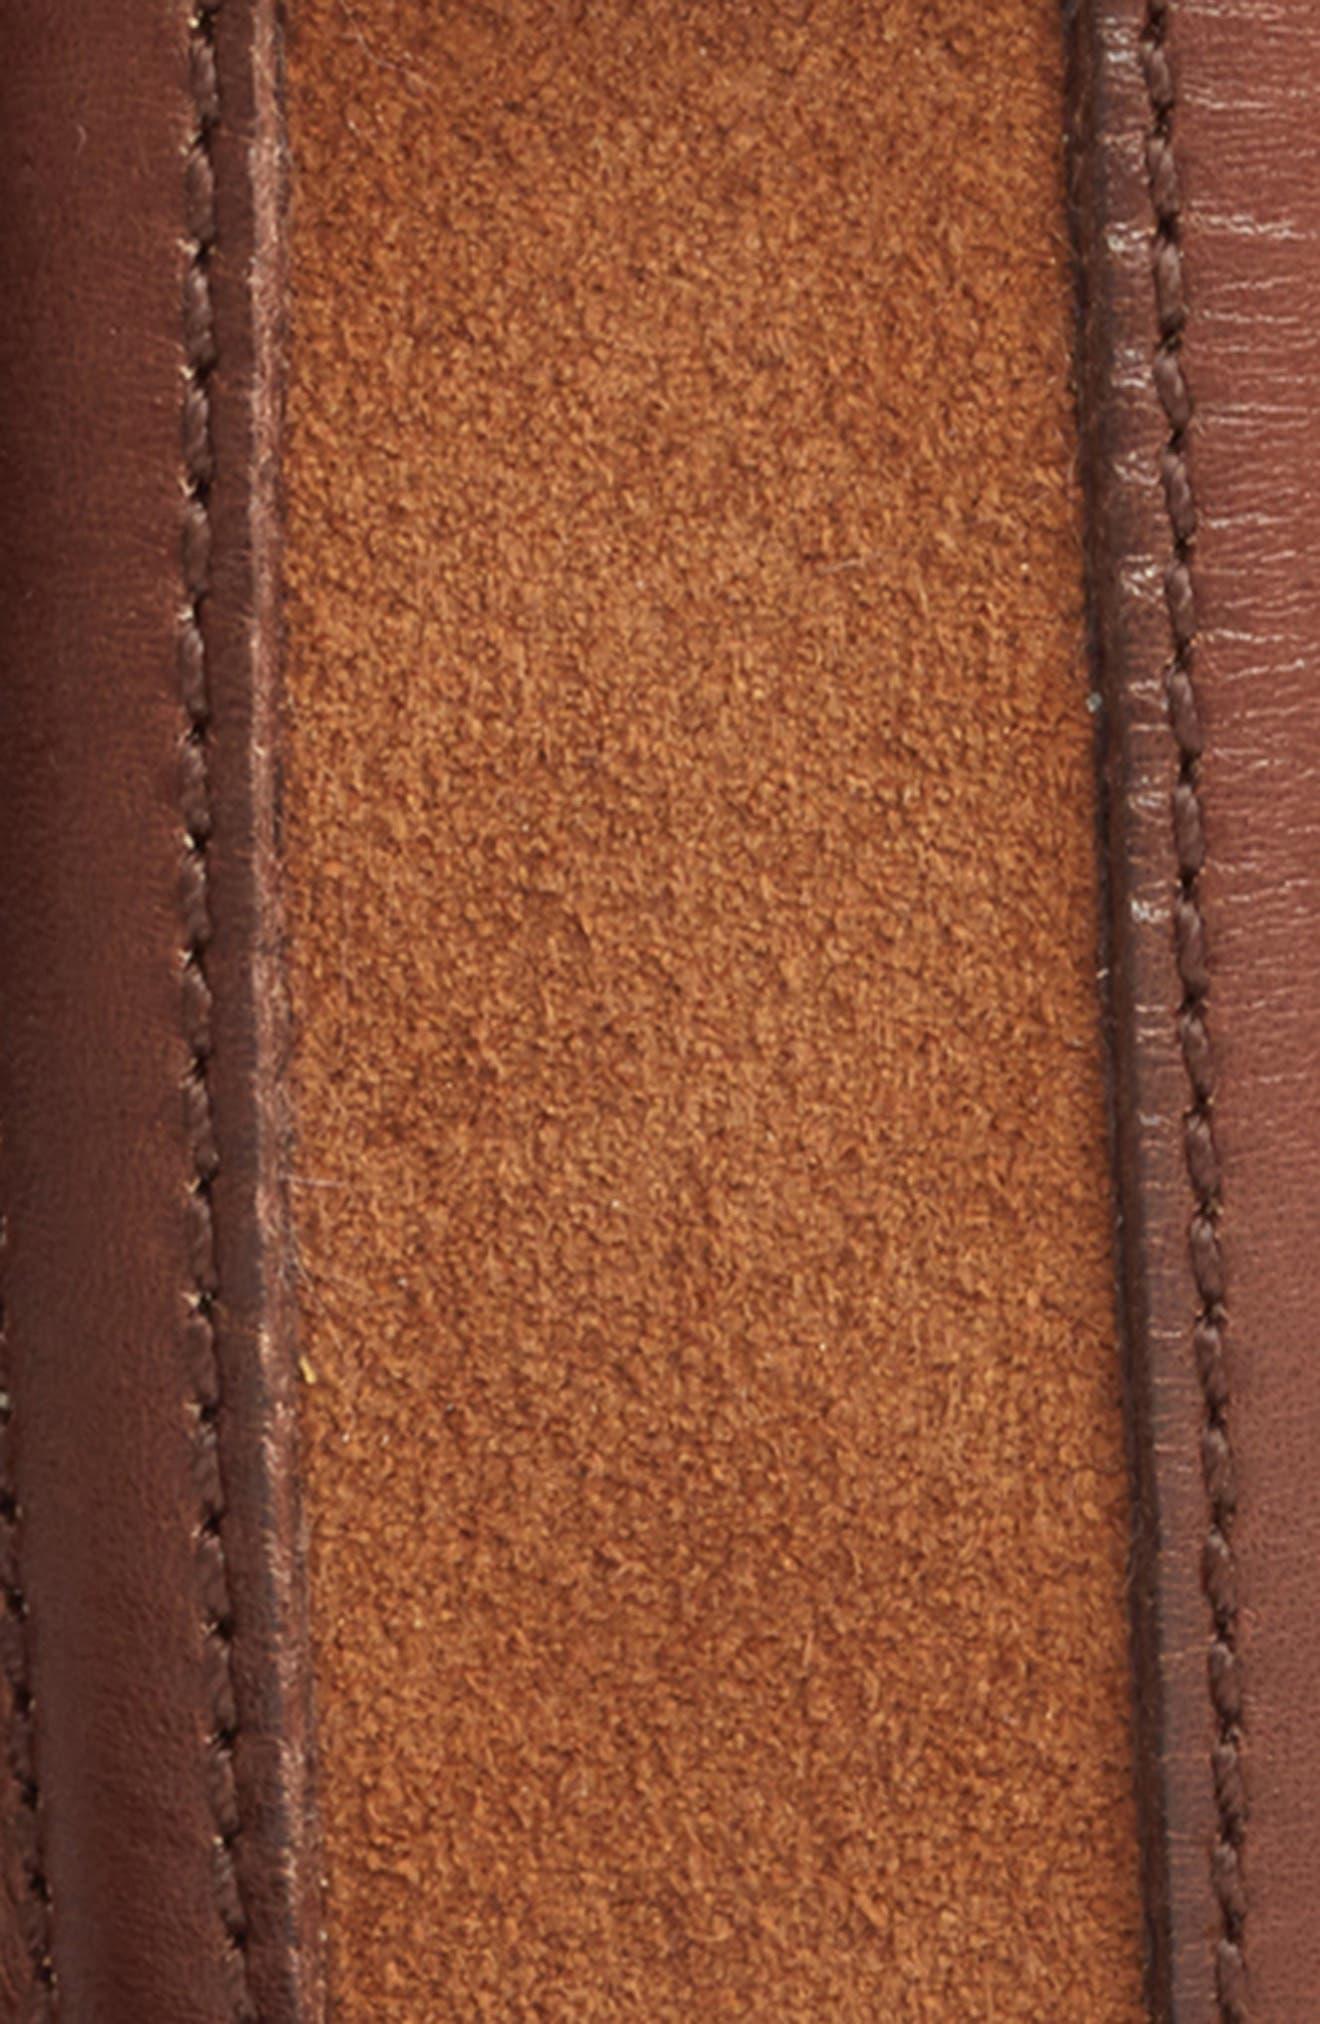 Fuju Suede & Leather Belt,                             Alternate thumbnail 2, color,                             Cognac